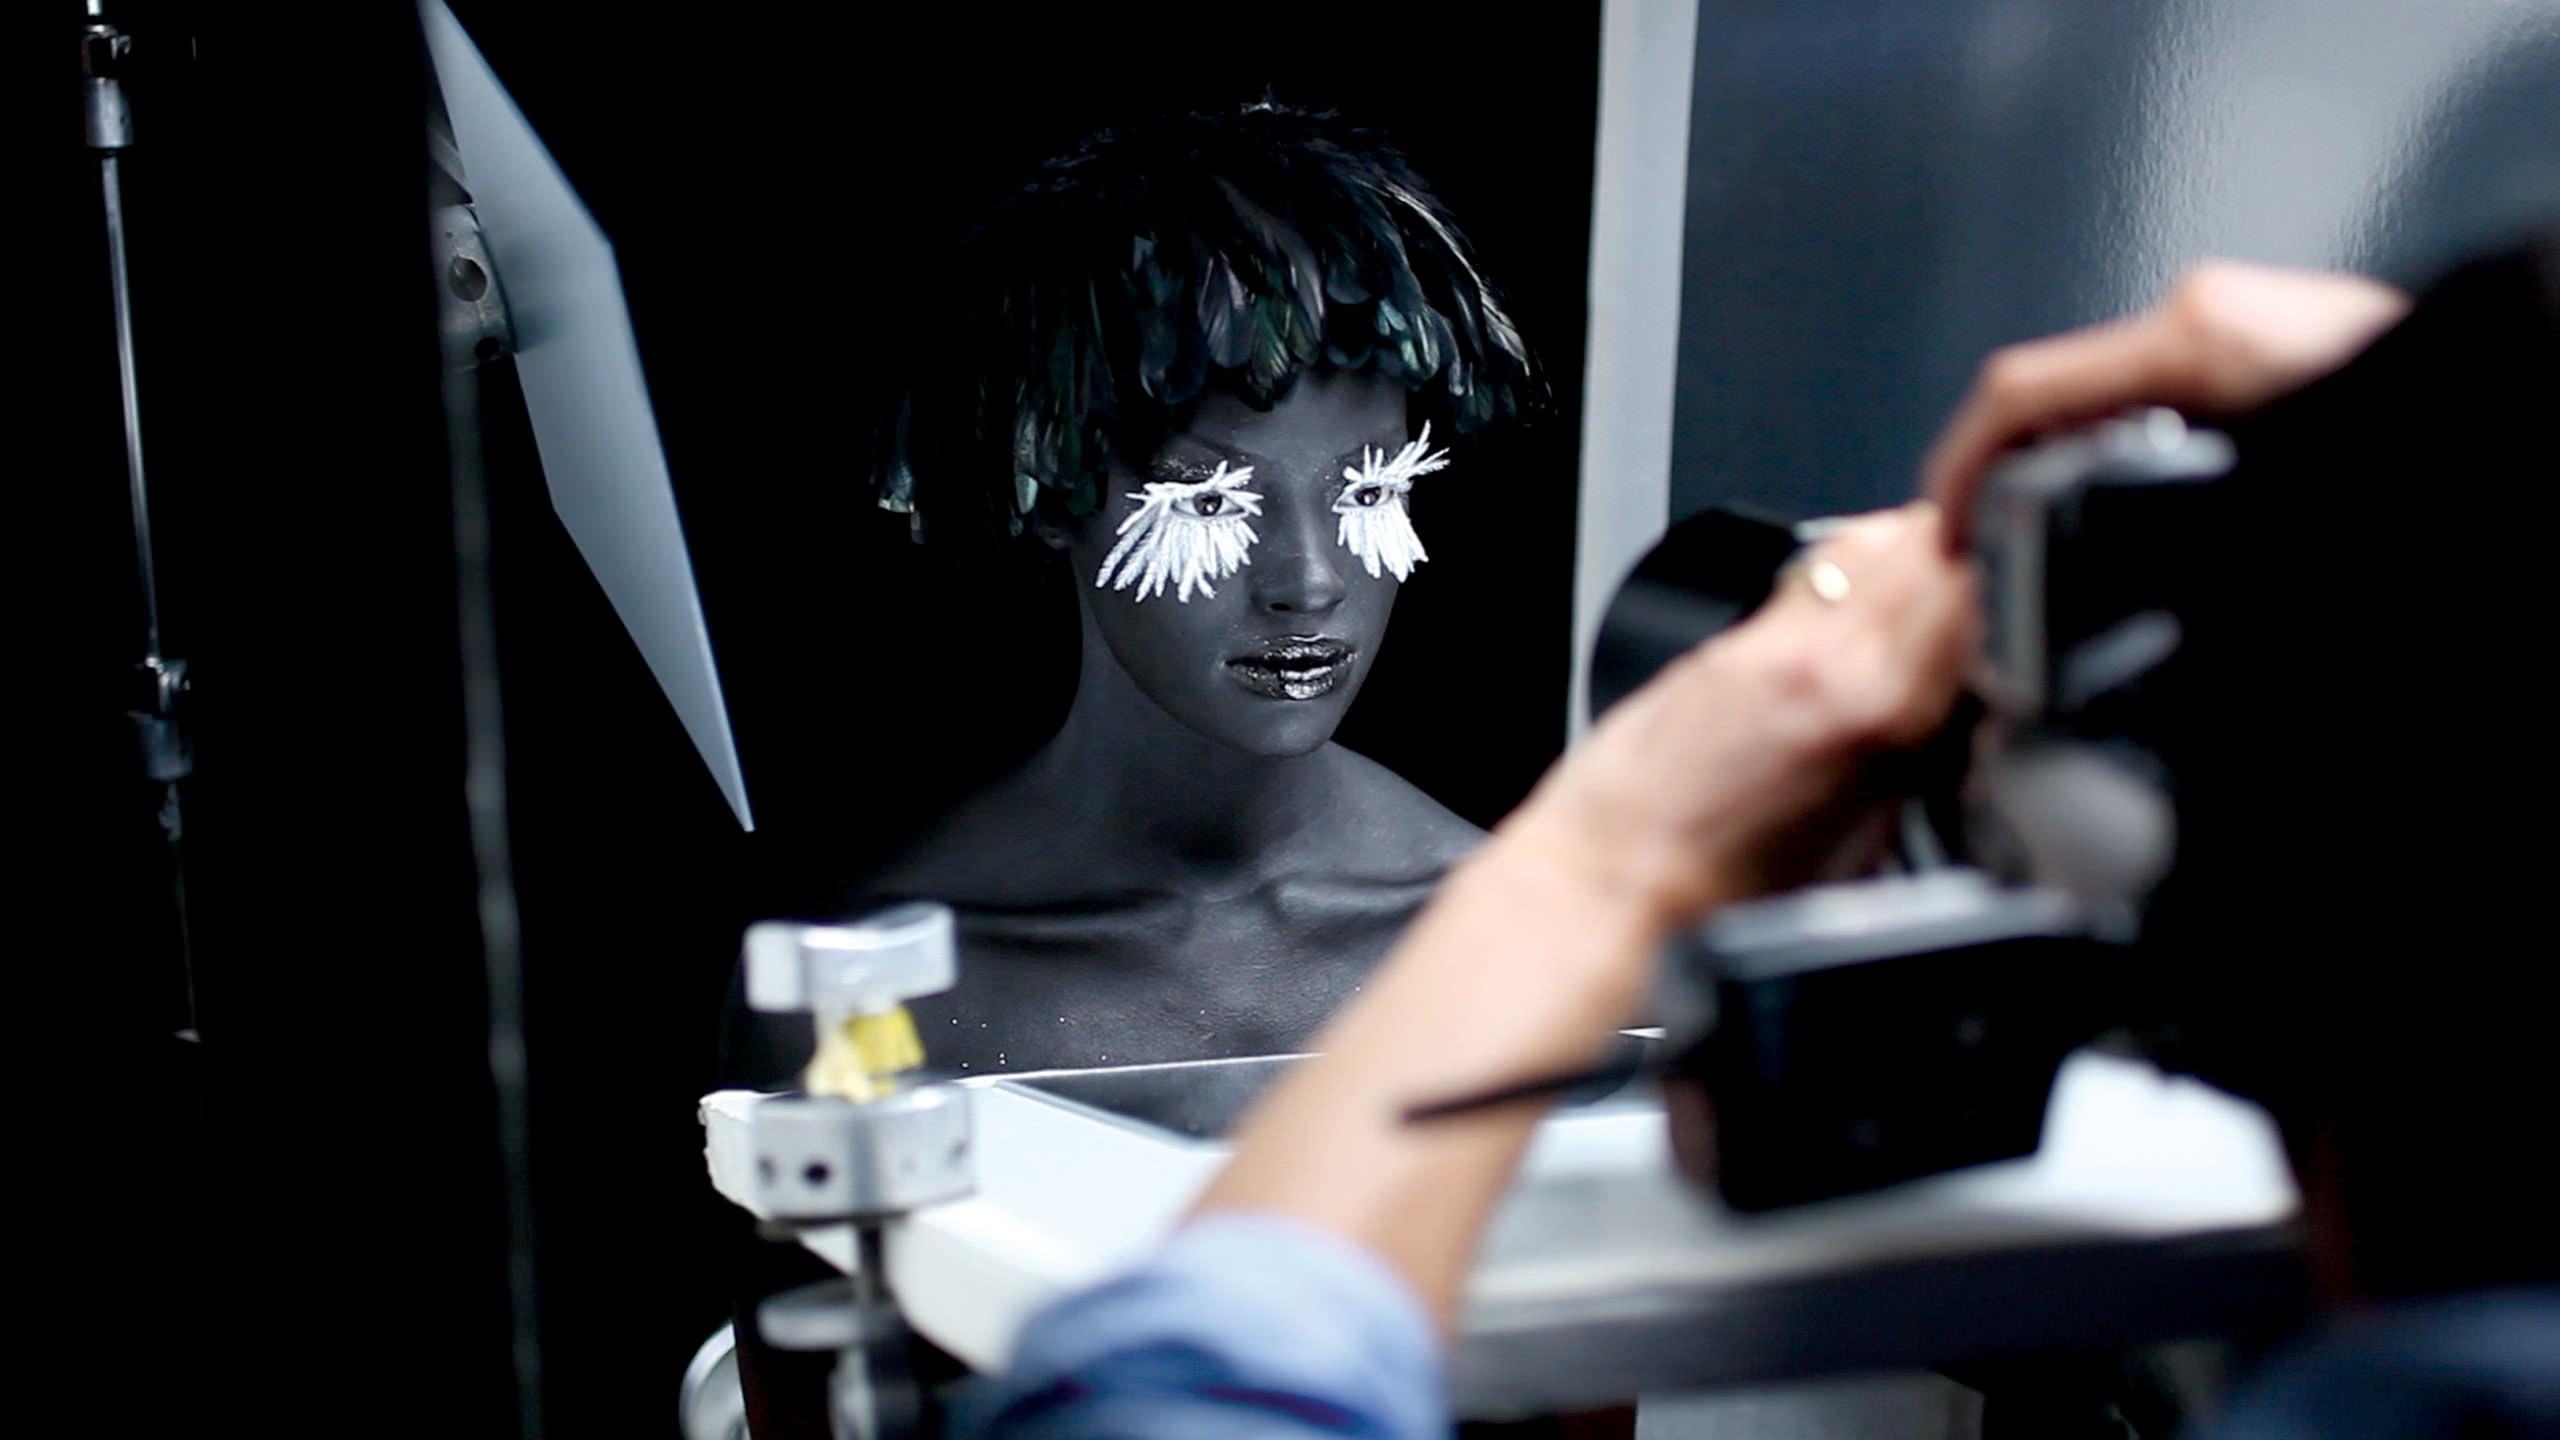 Adobe Lightroom Photoshoot Behind-the-scenes